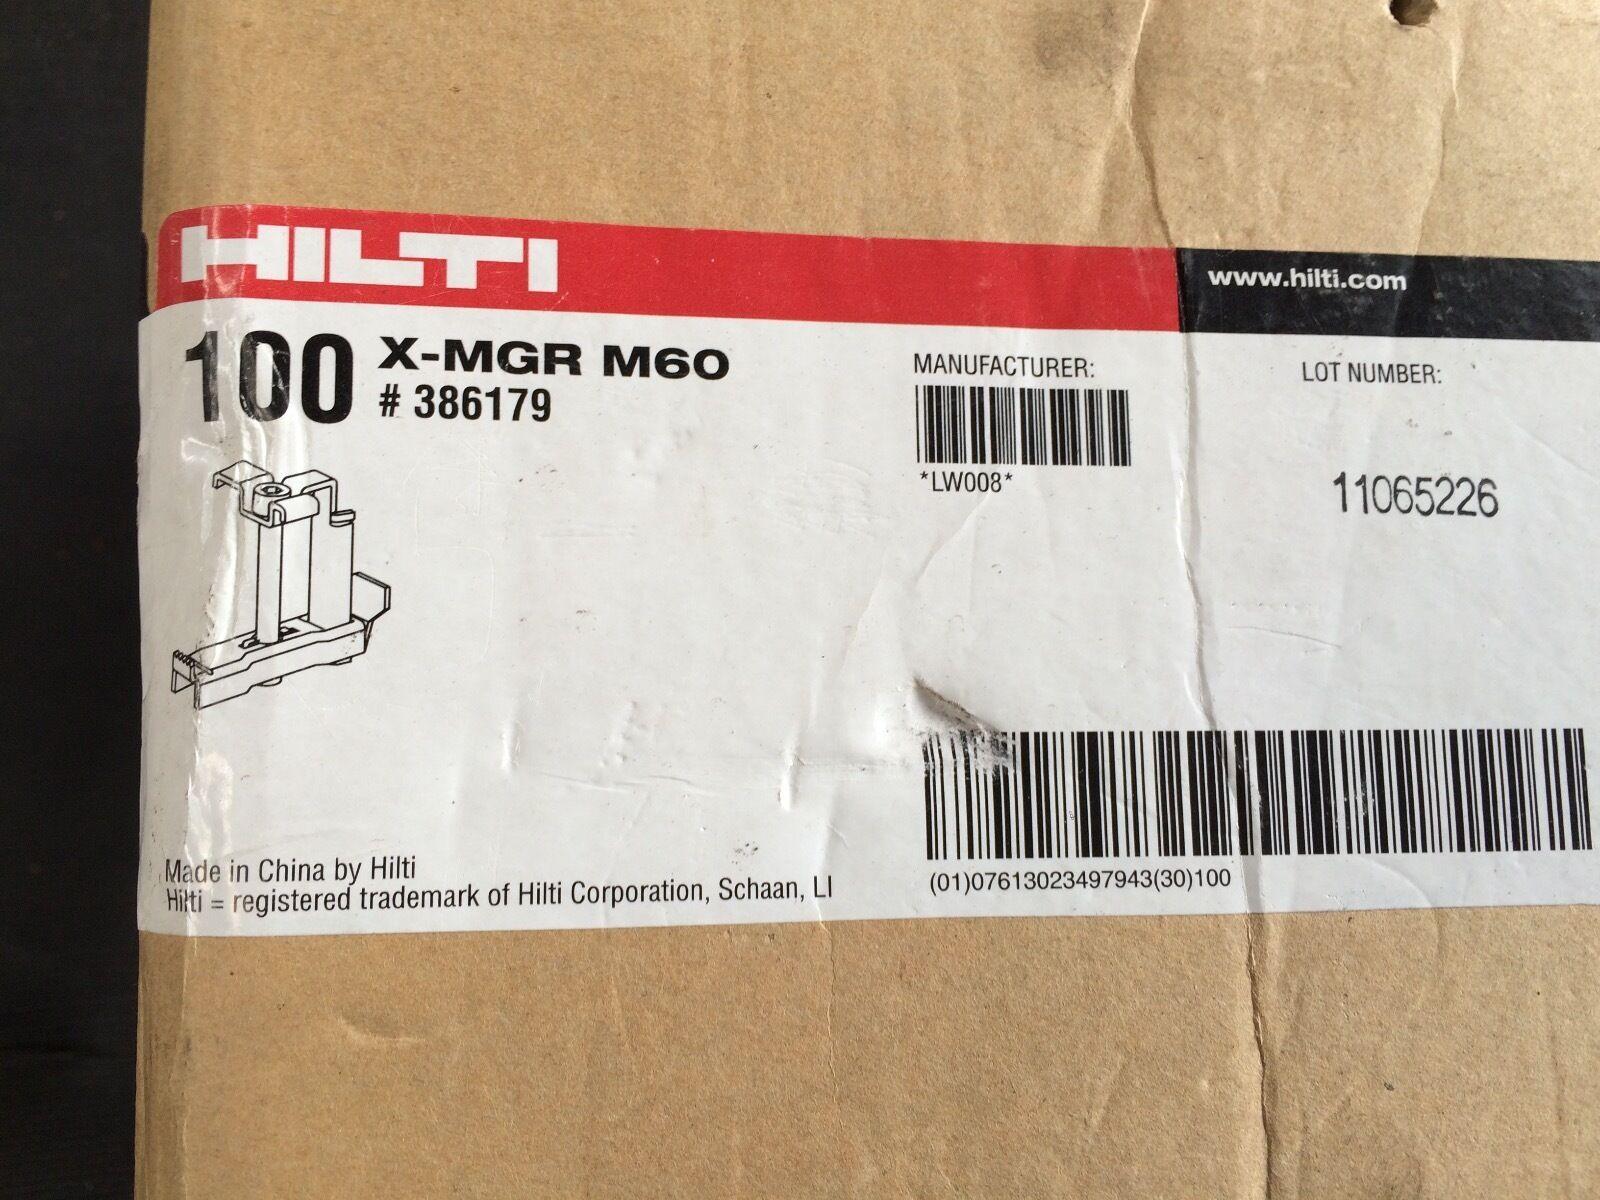 Gitterrostklemme Gitterrostbefestigung verzinkt X-MGR für Masche 30//30